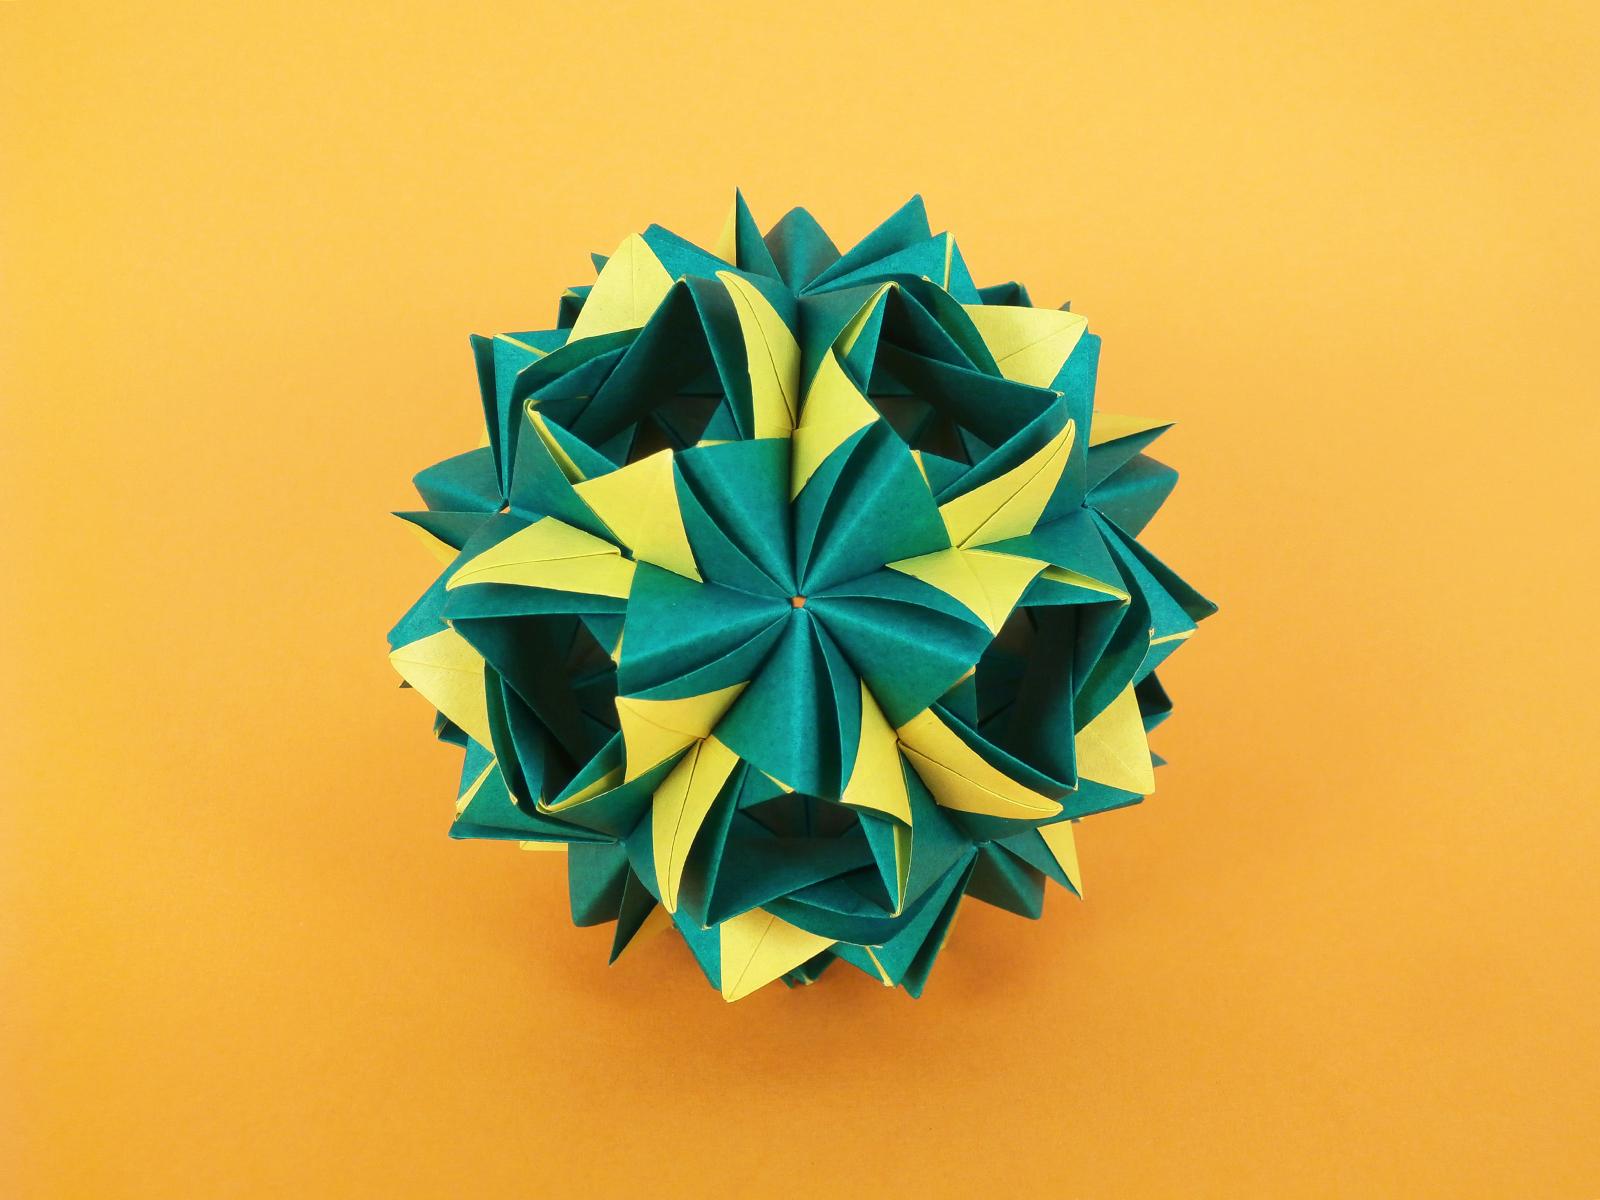 Wallpaper kusudama origamiwork origamiart foliage origami kusudama origamiwork origamiart foliage origami paper paperfolding modularorigami unitorigami folded symmetry design handmade art jeuxipadfo Gallery